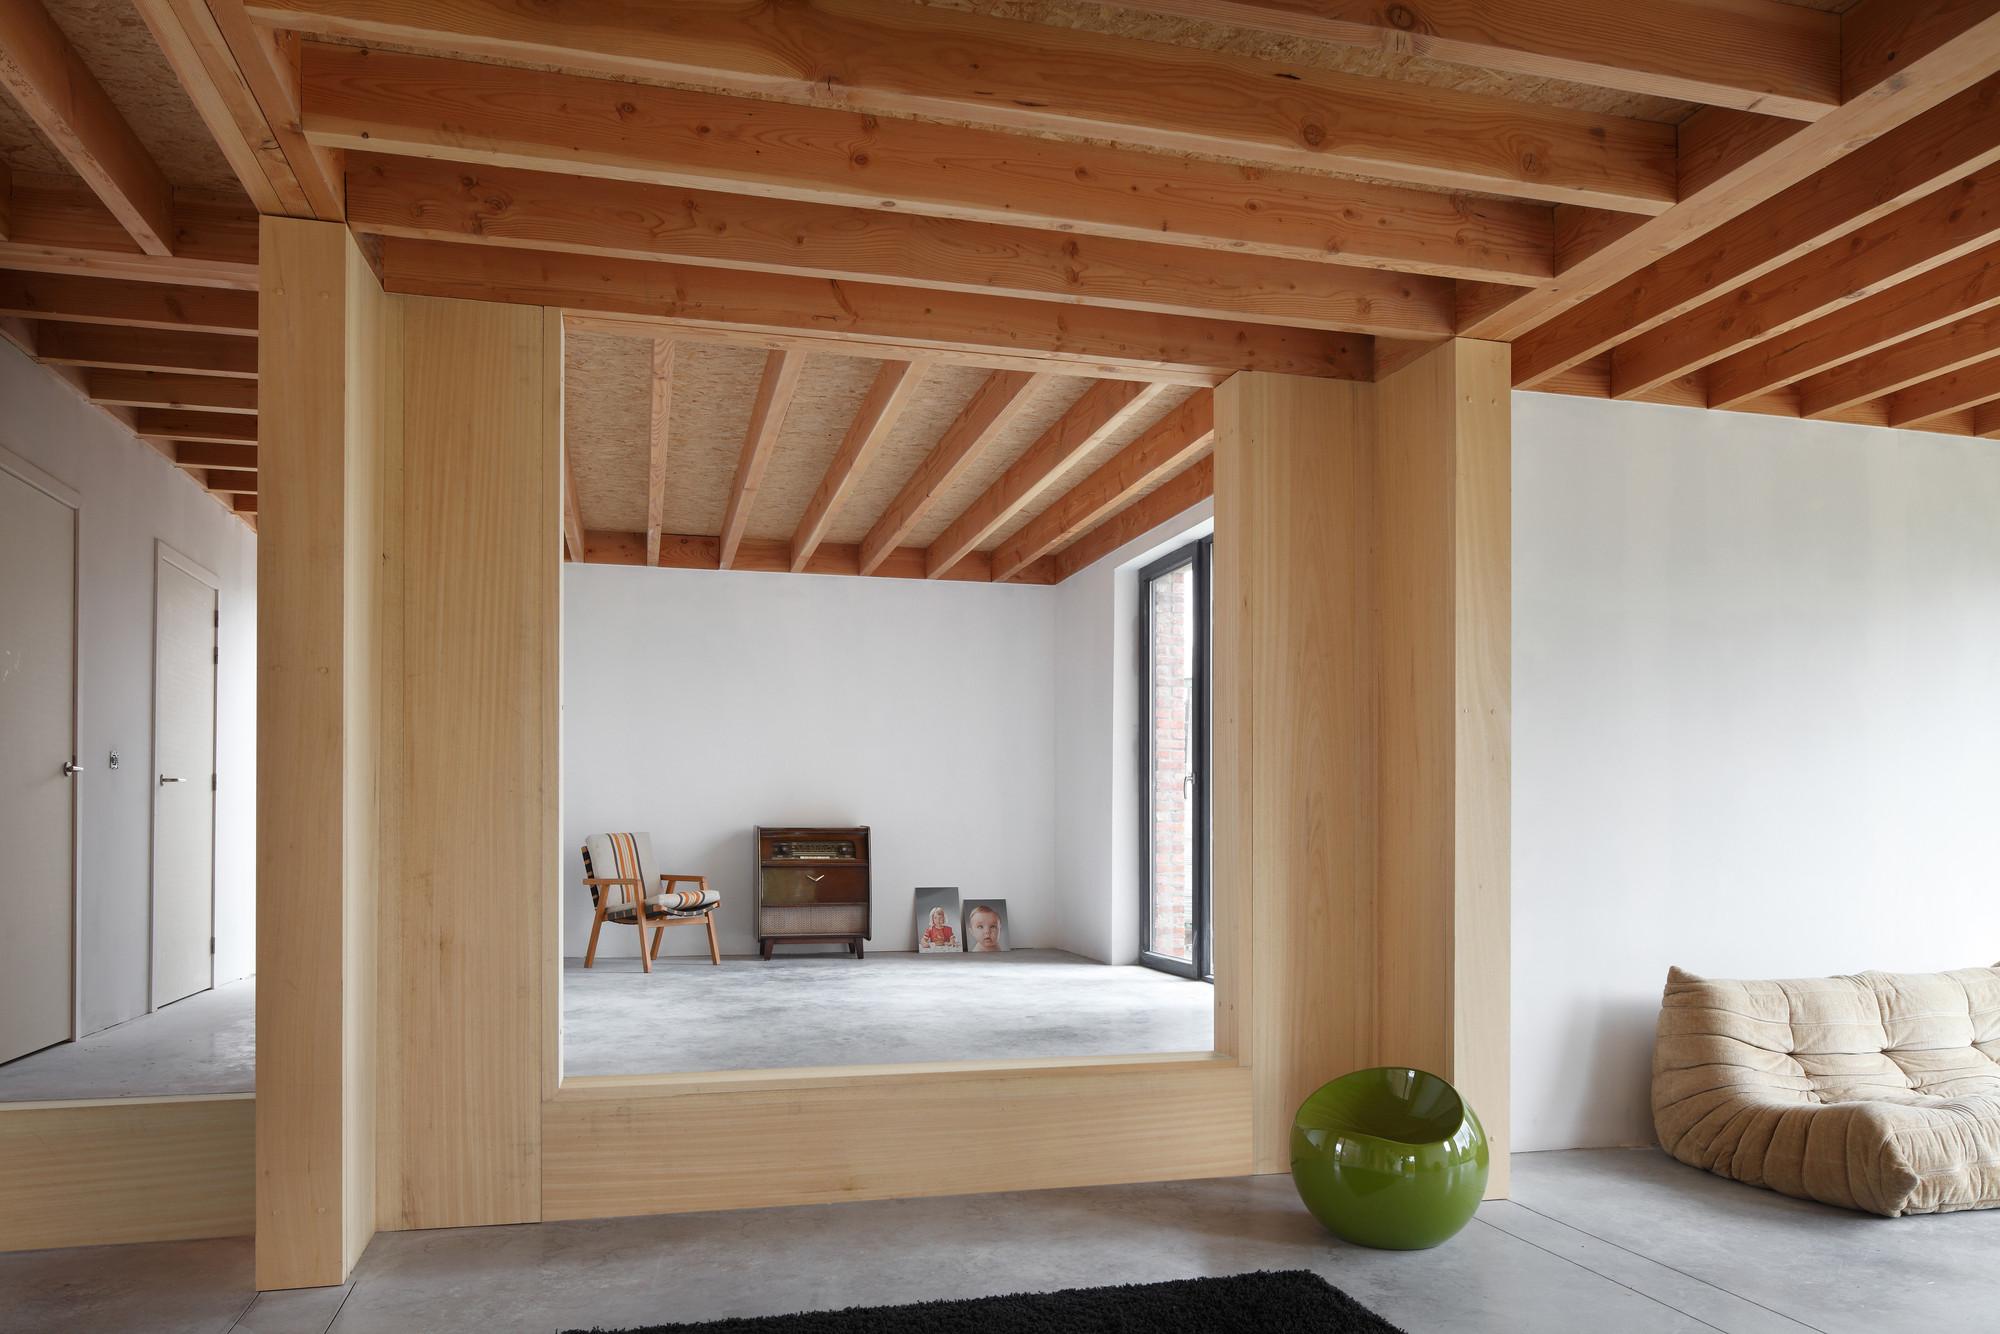 dnA House / BLAF Architecten, © Stijn Bollaert